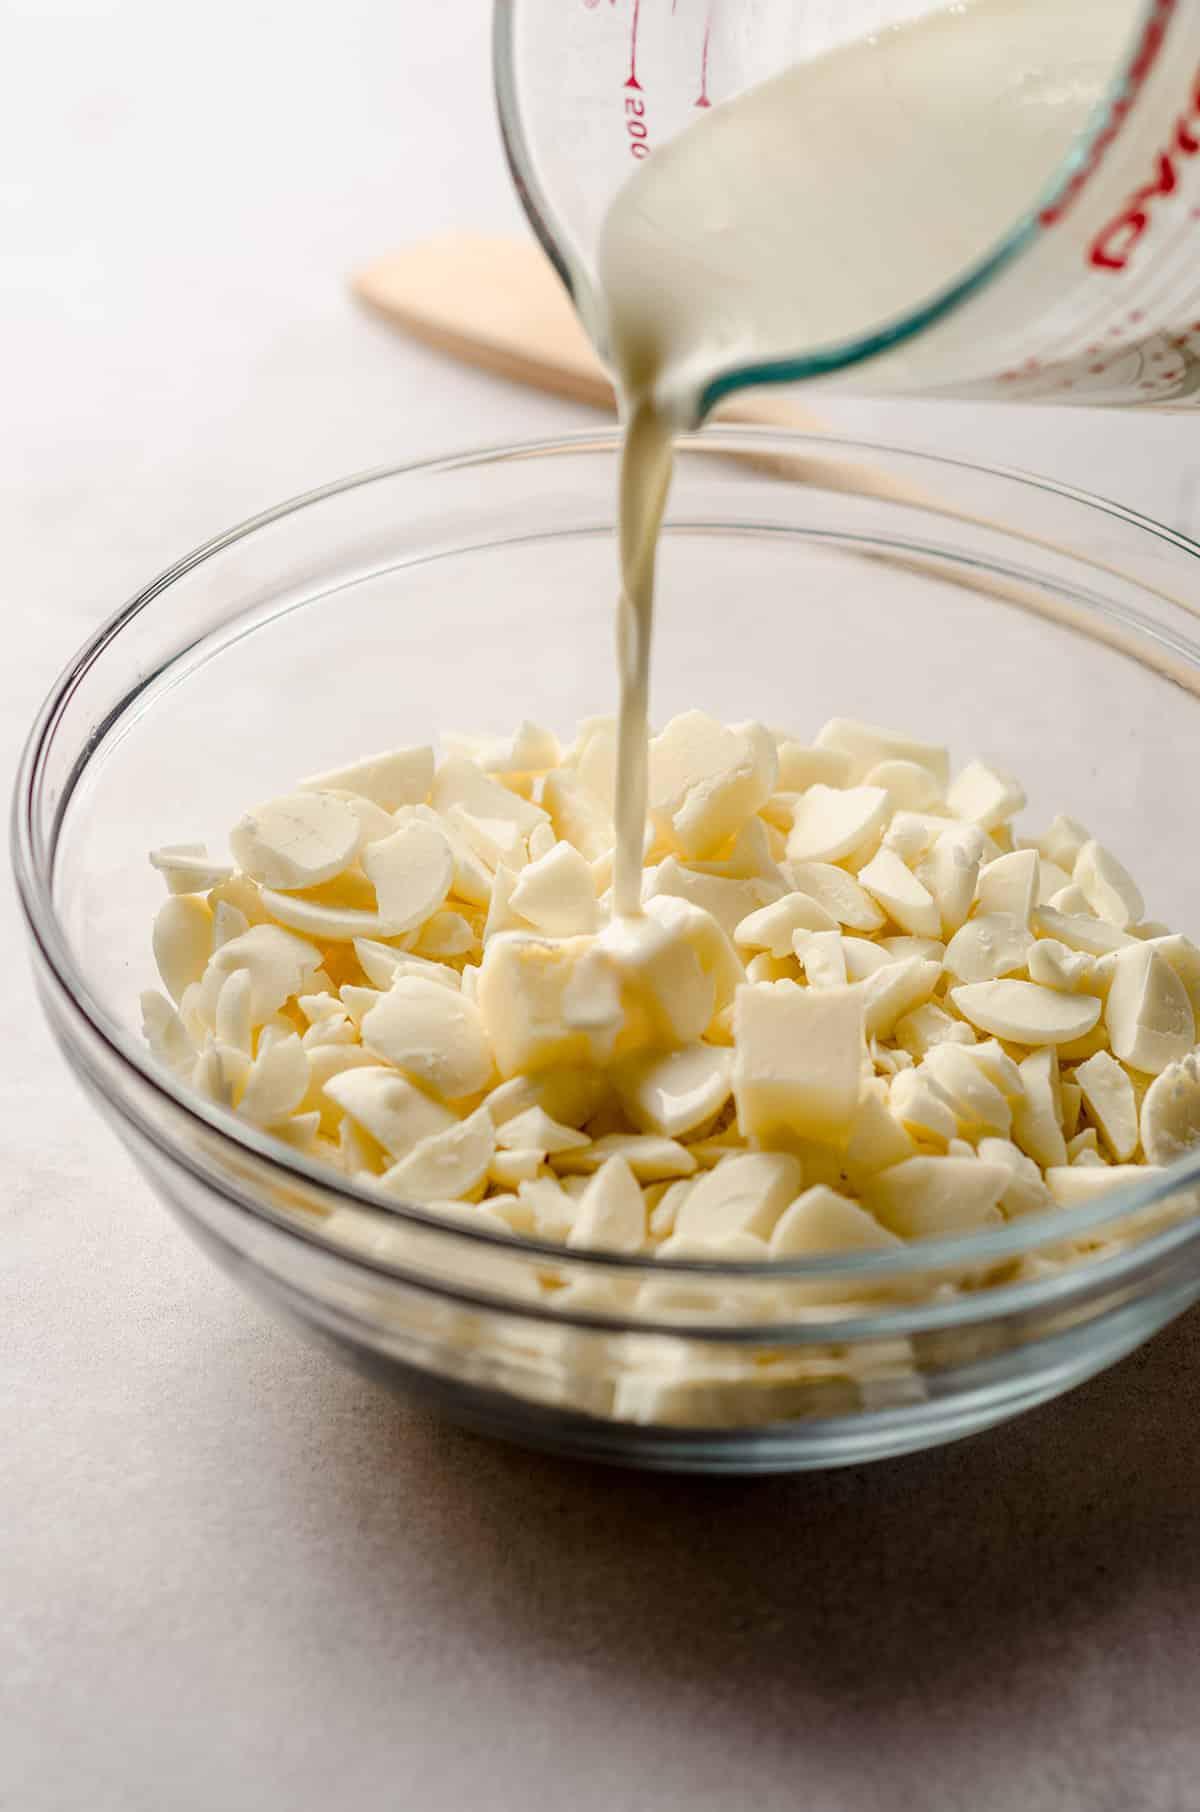 pouring hot cream onto white chocolate to make ganache